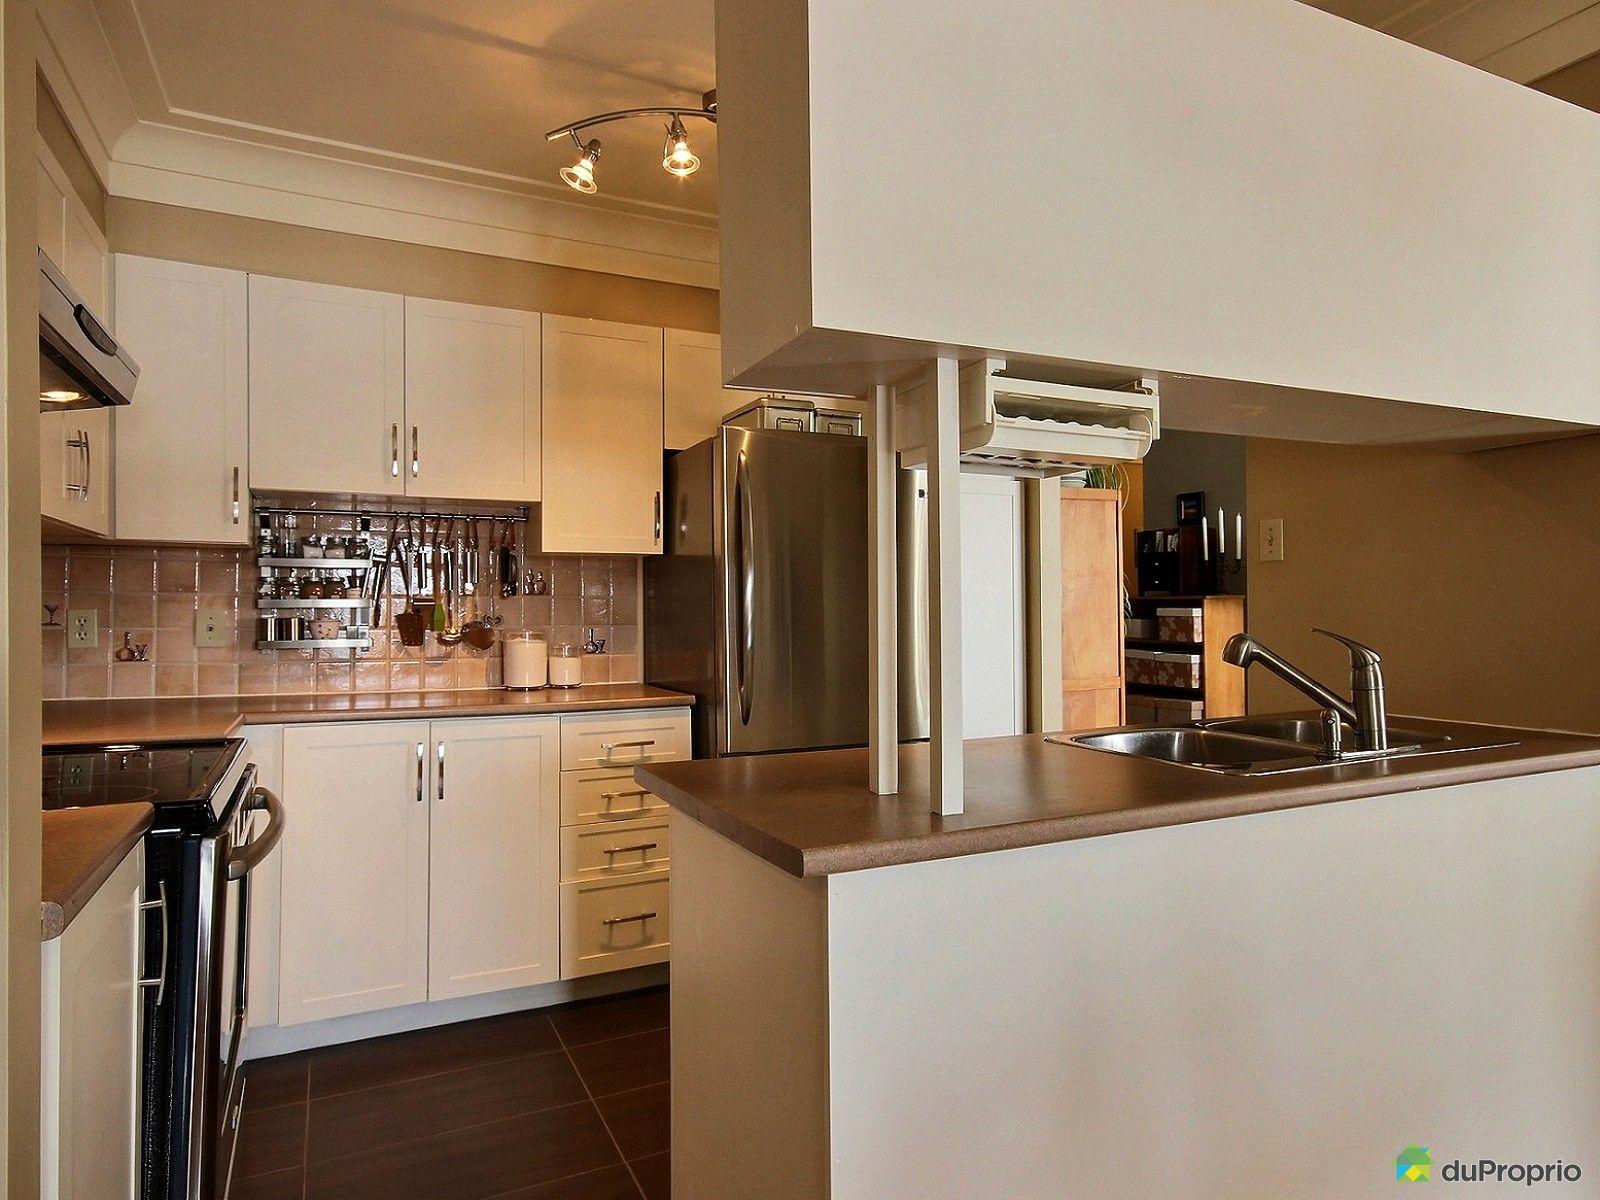 condo vendu richelieu immobilier qu bec duproprio 575271. Black Bedroom Furniture Sets. Home Design Ideas